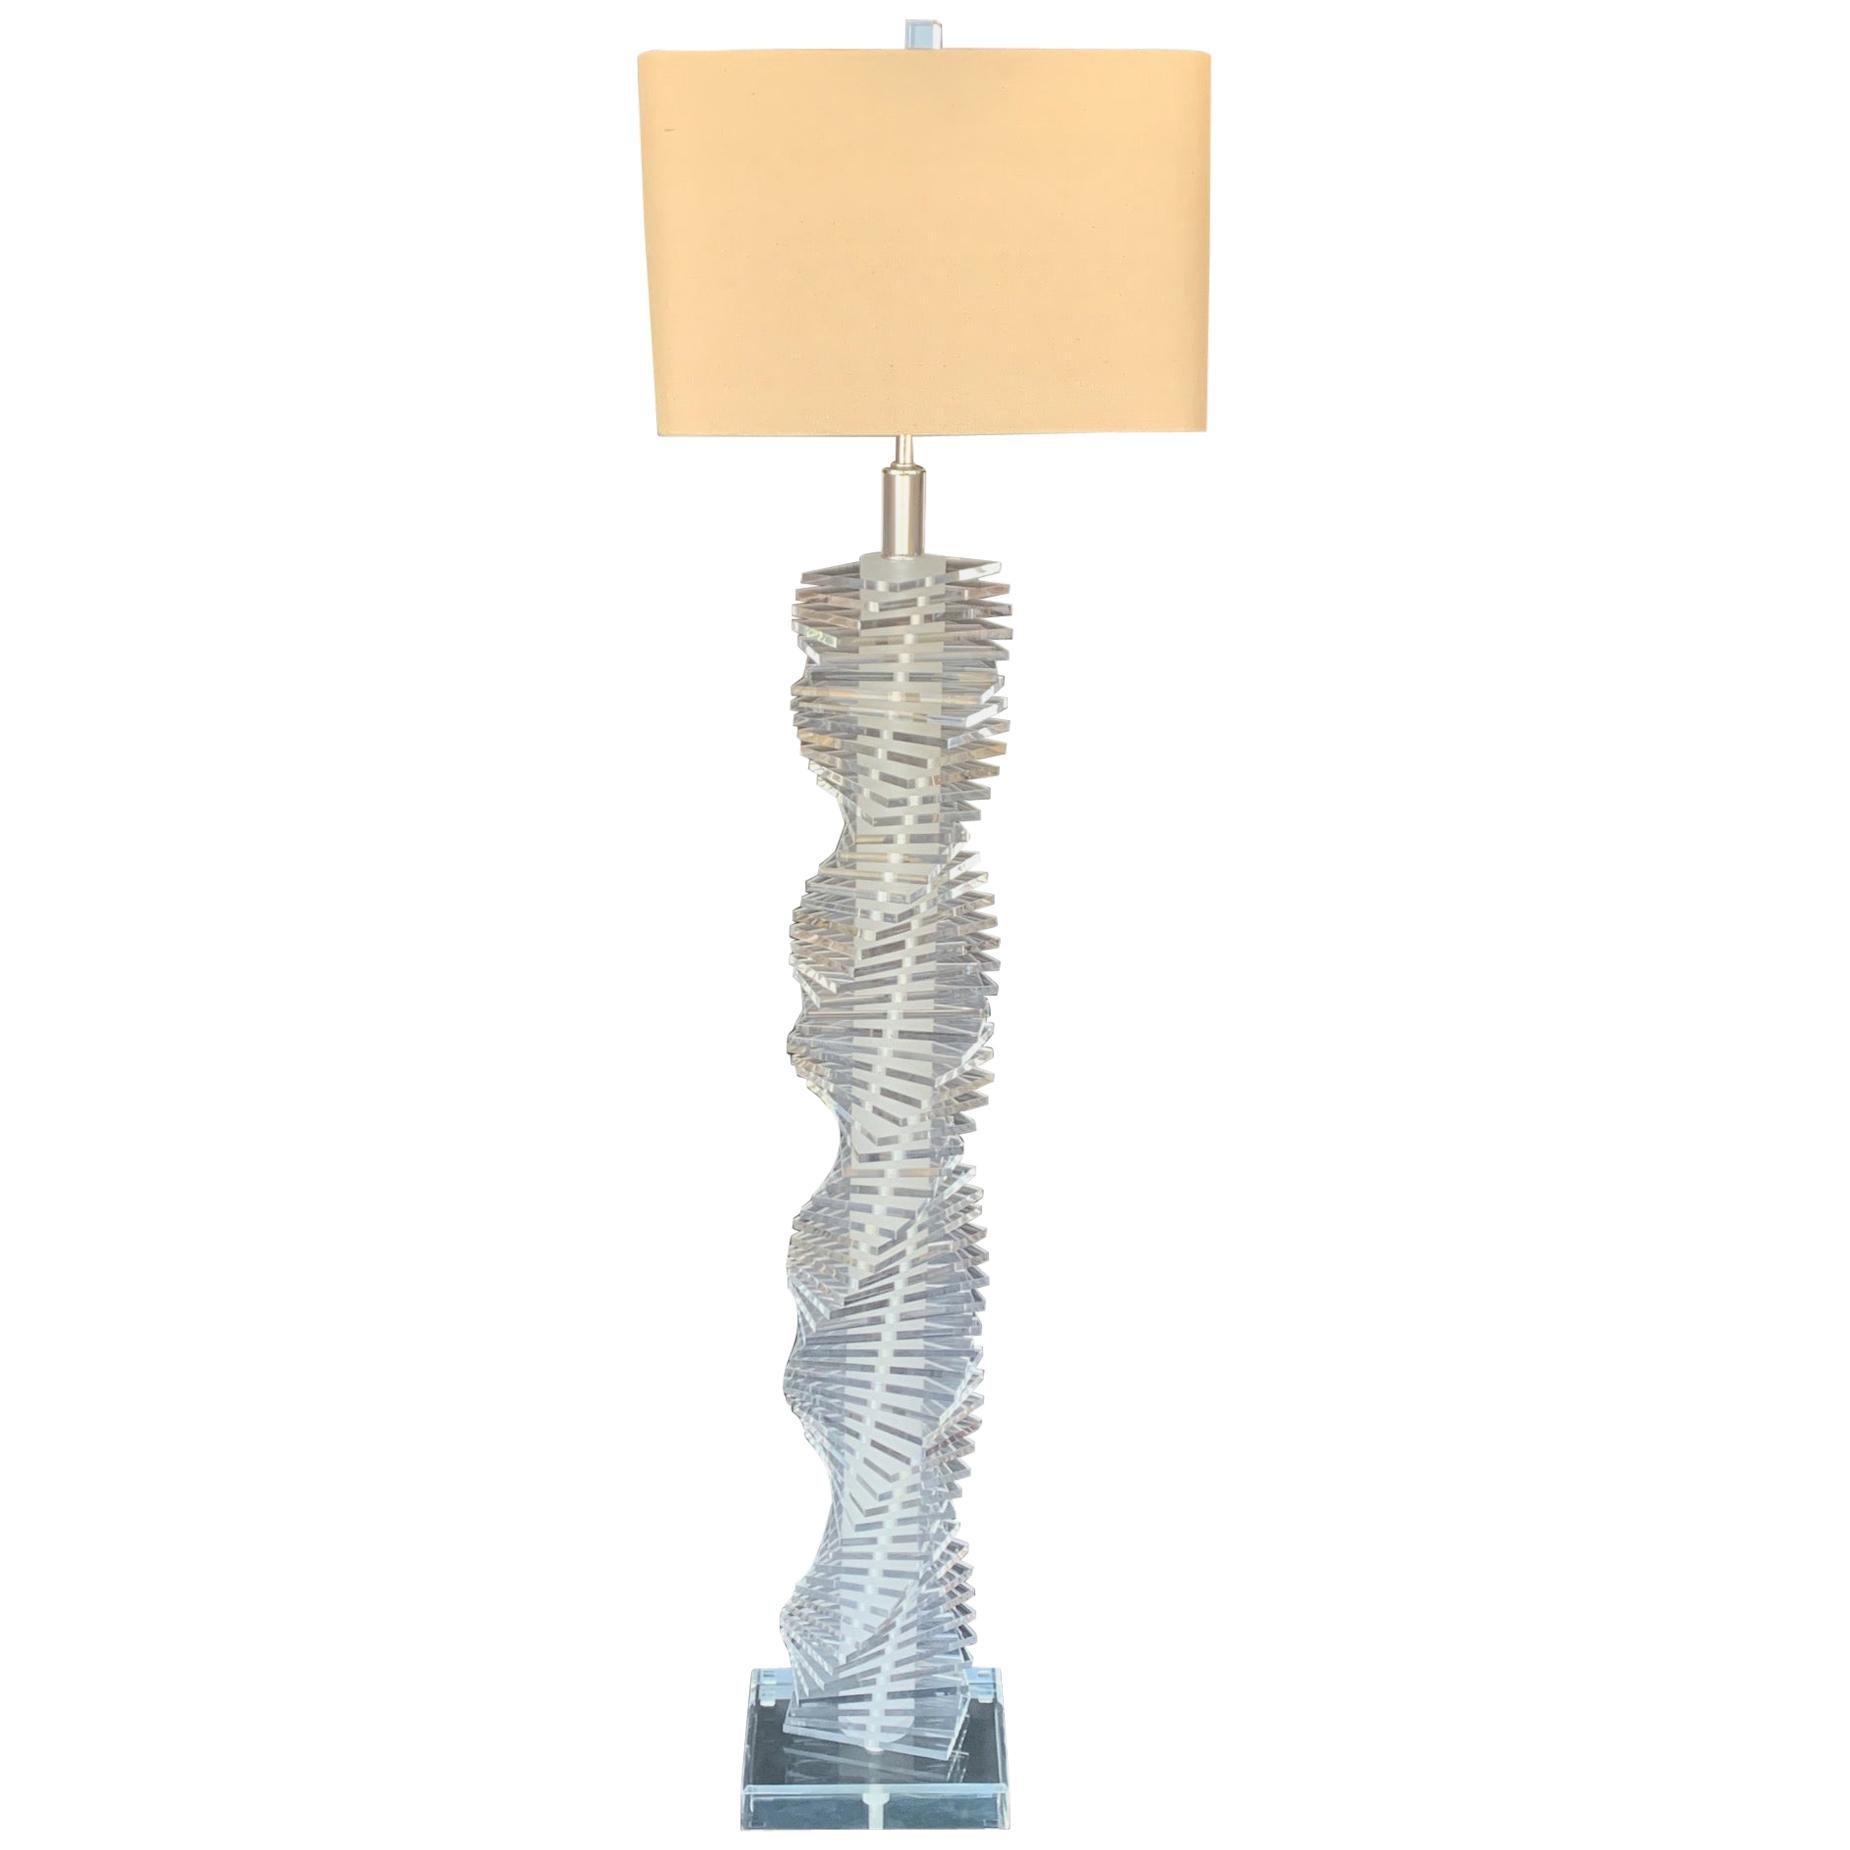 Acrylic Floor Lamp